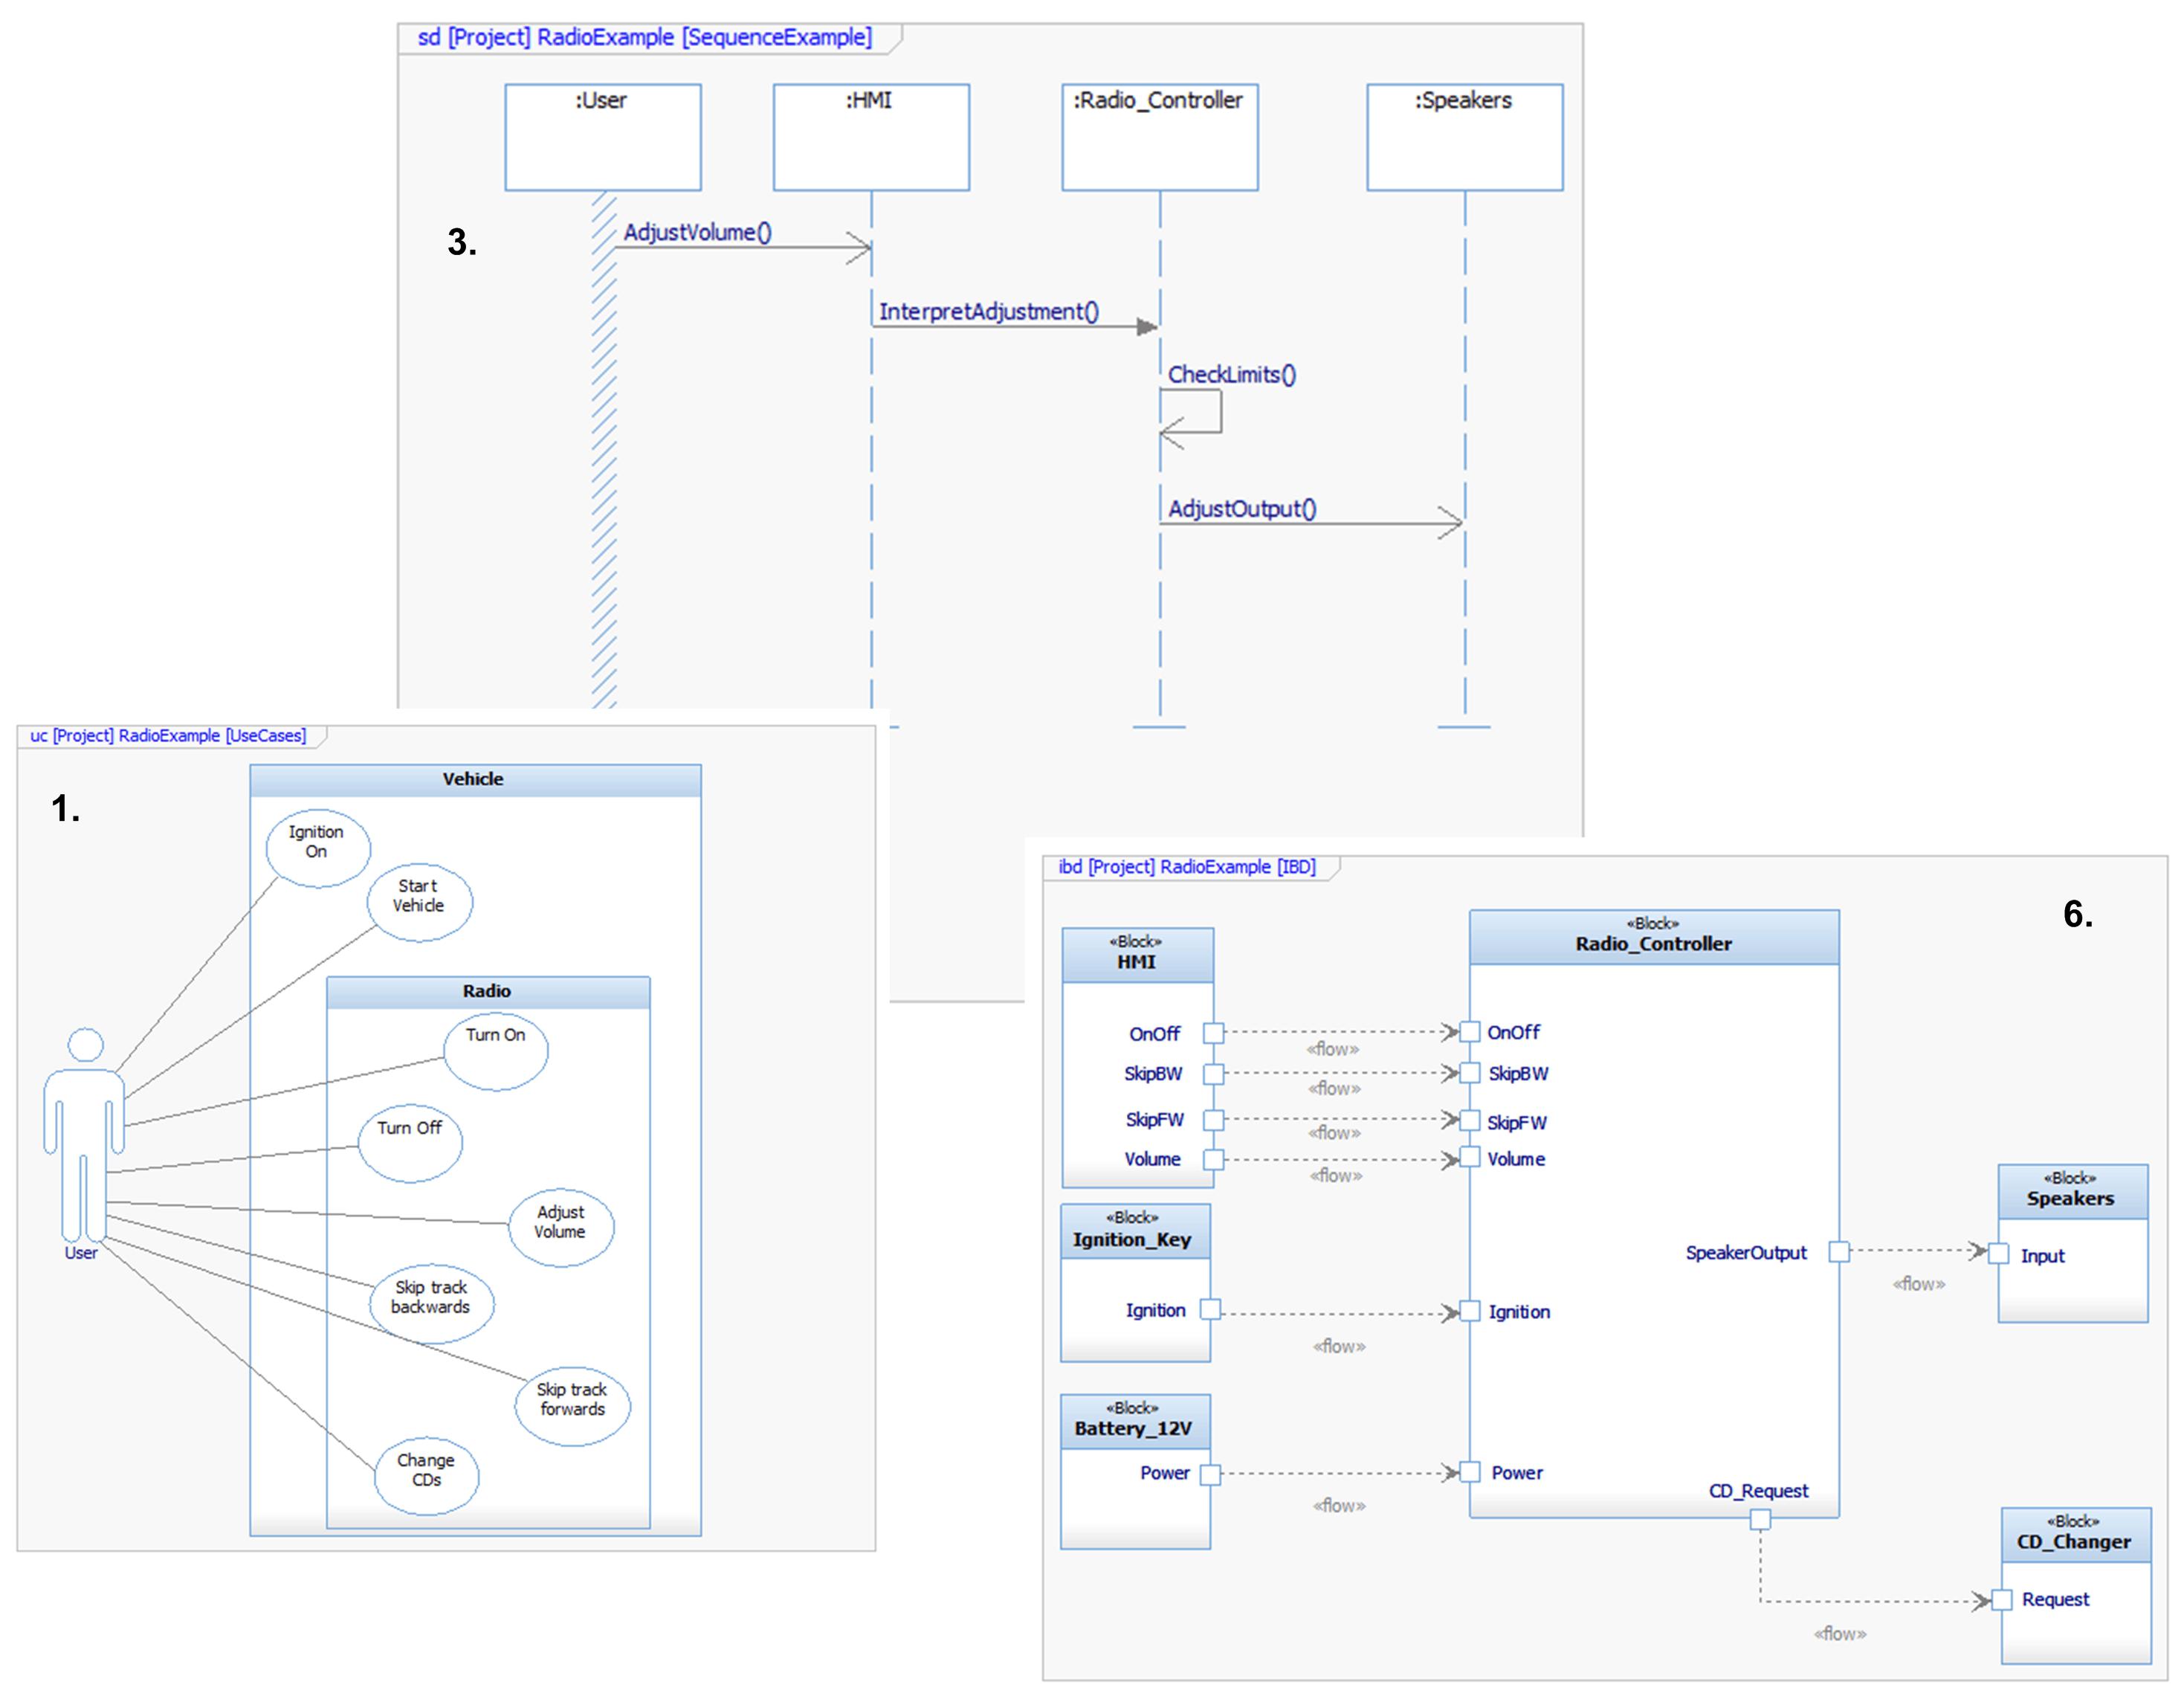 Figure 2: A Use Case Diagram, Sequence Diagram and Internal Block Diagram for a Radio Controller example.